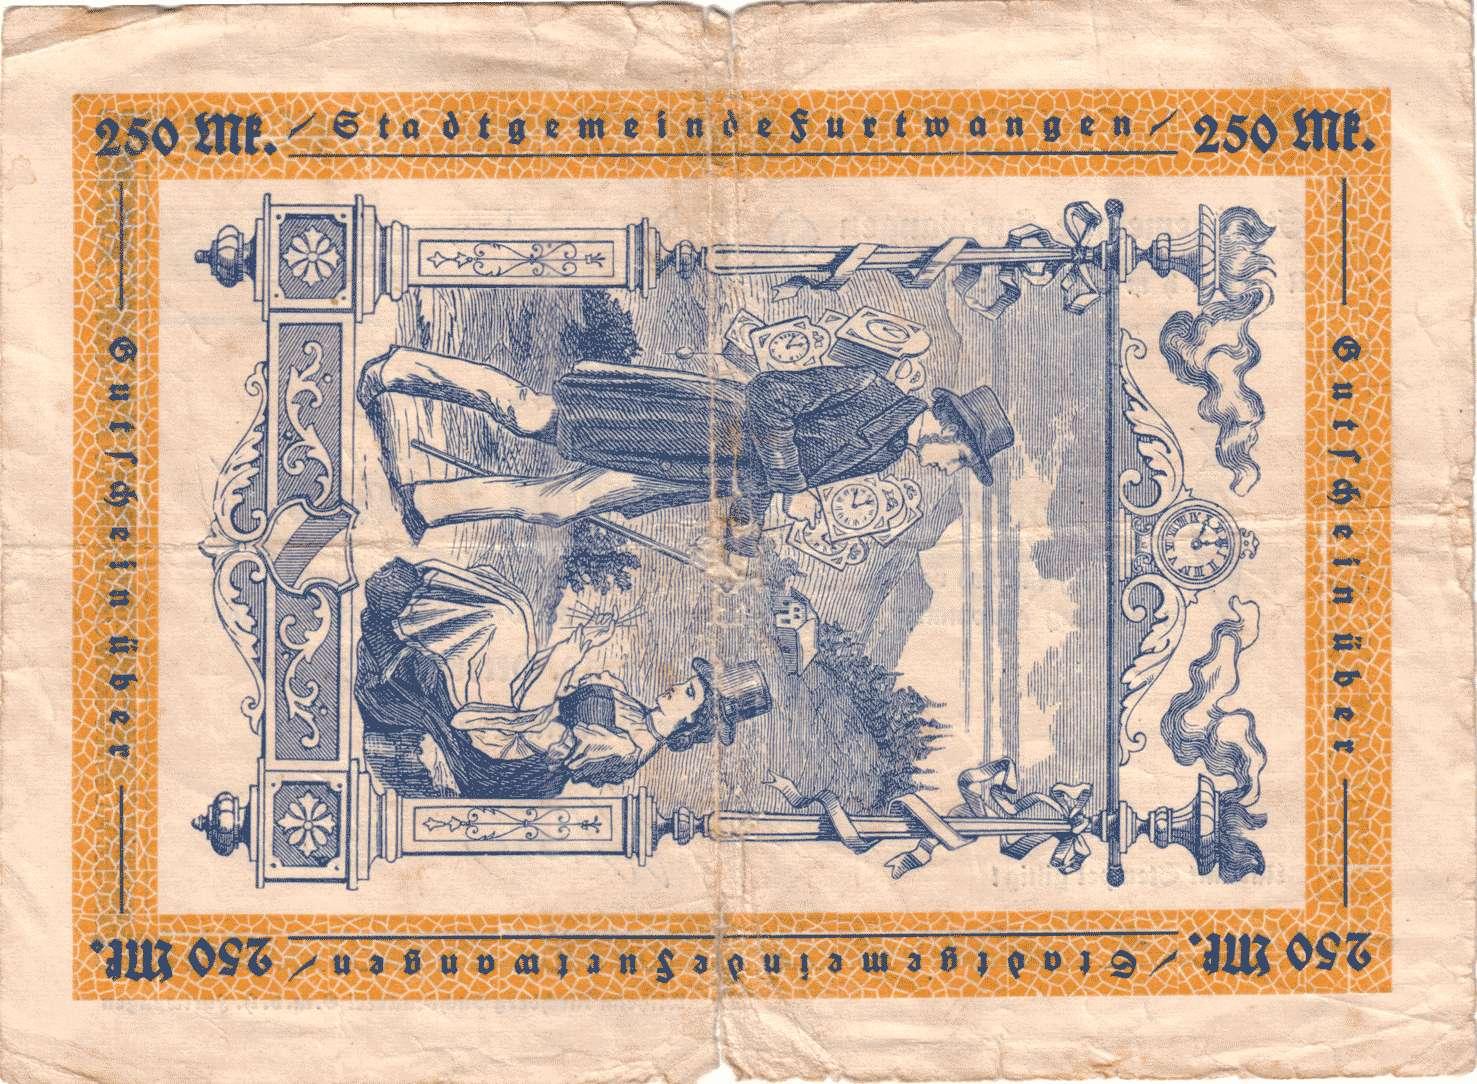 Notgeld der Stadtgemeinde Furtwangen, Bild 2